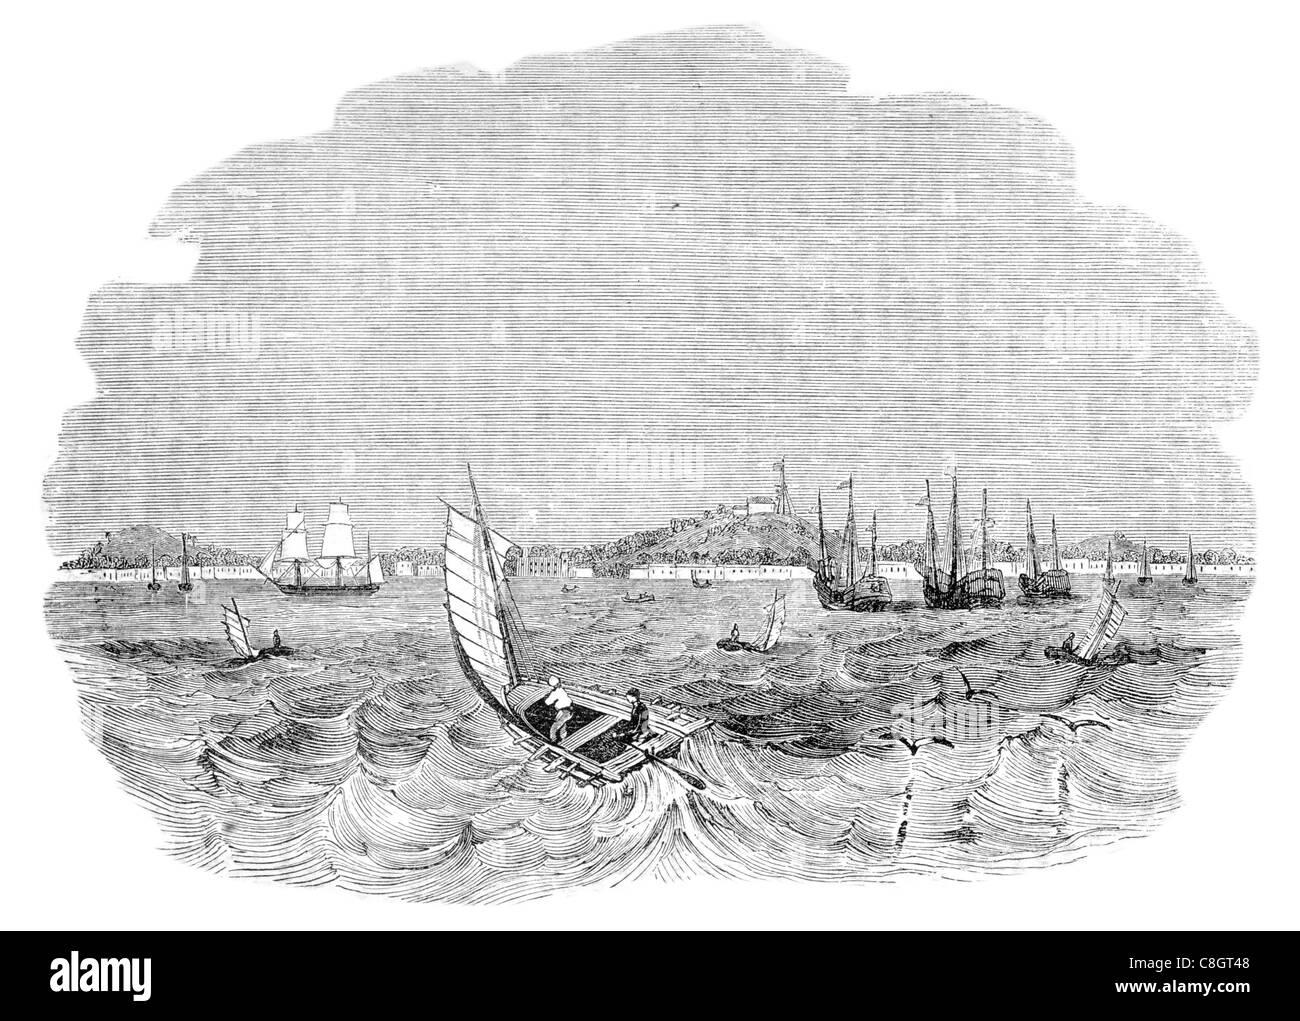 flat sterned boat vessel Singapore fishing sailor fisherman sail sailing sailor ship ships shipping marine cargo - Stock Image